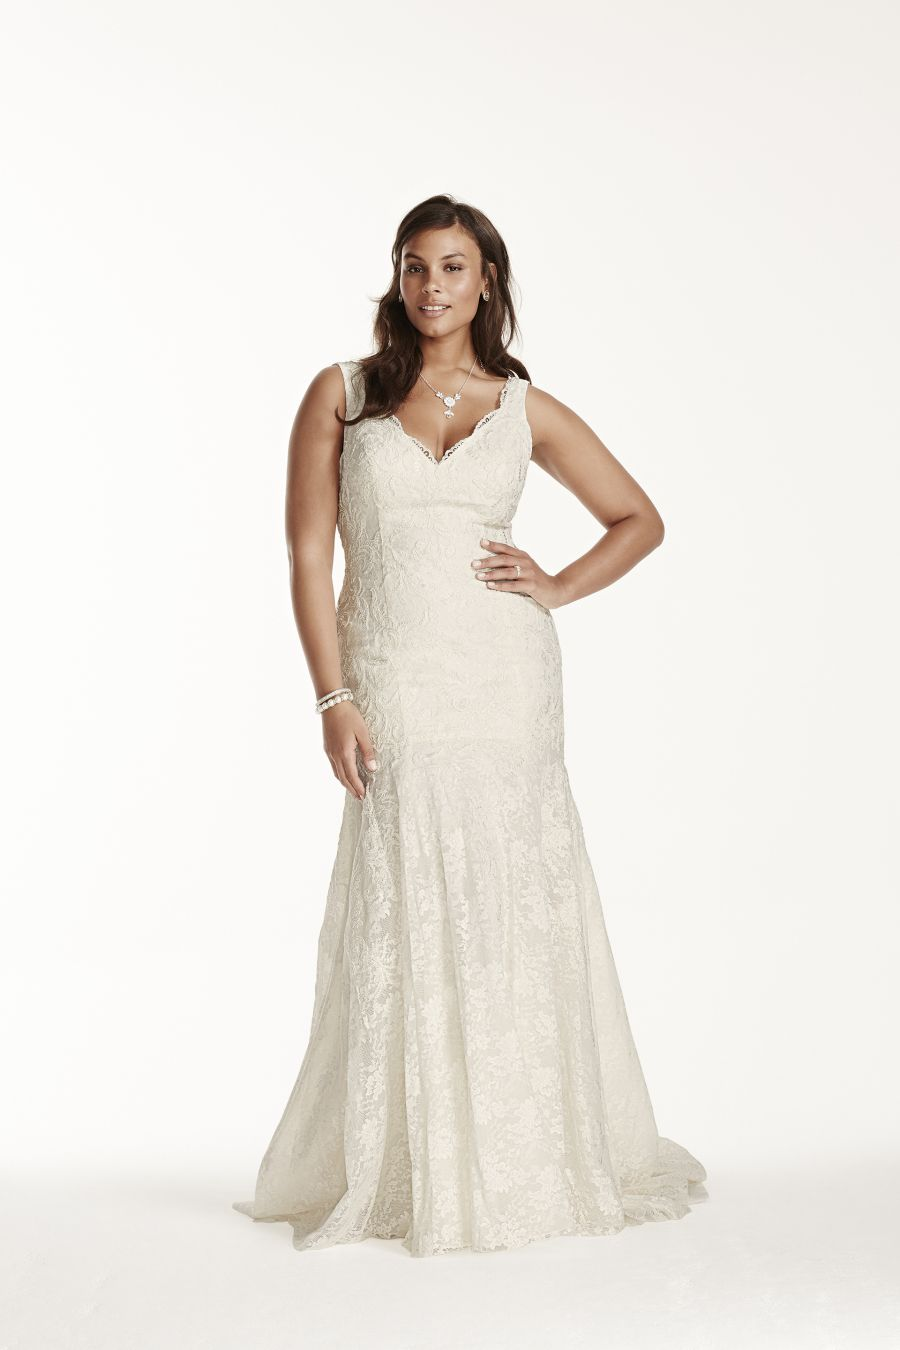 Cheap Wedding Dresses Under 50 Dollars.Cheap Plus Size Wedding Dresses Under 50 Dollars Raveitsafe